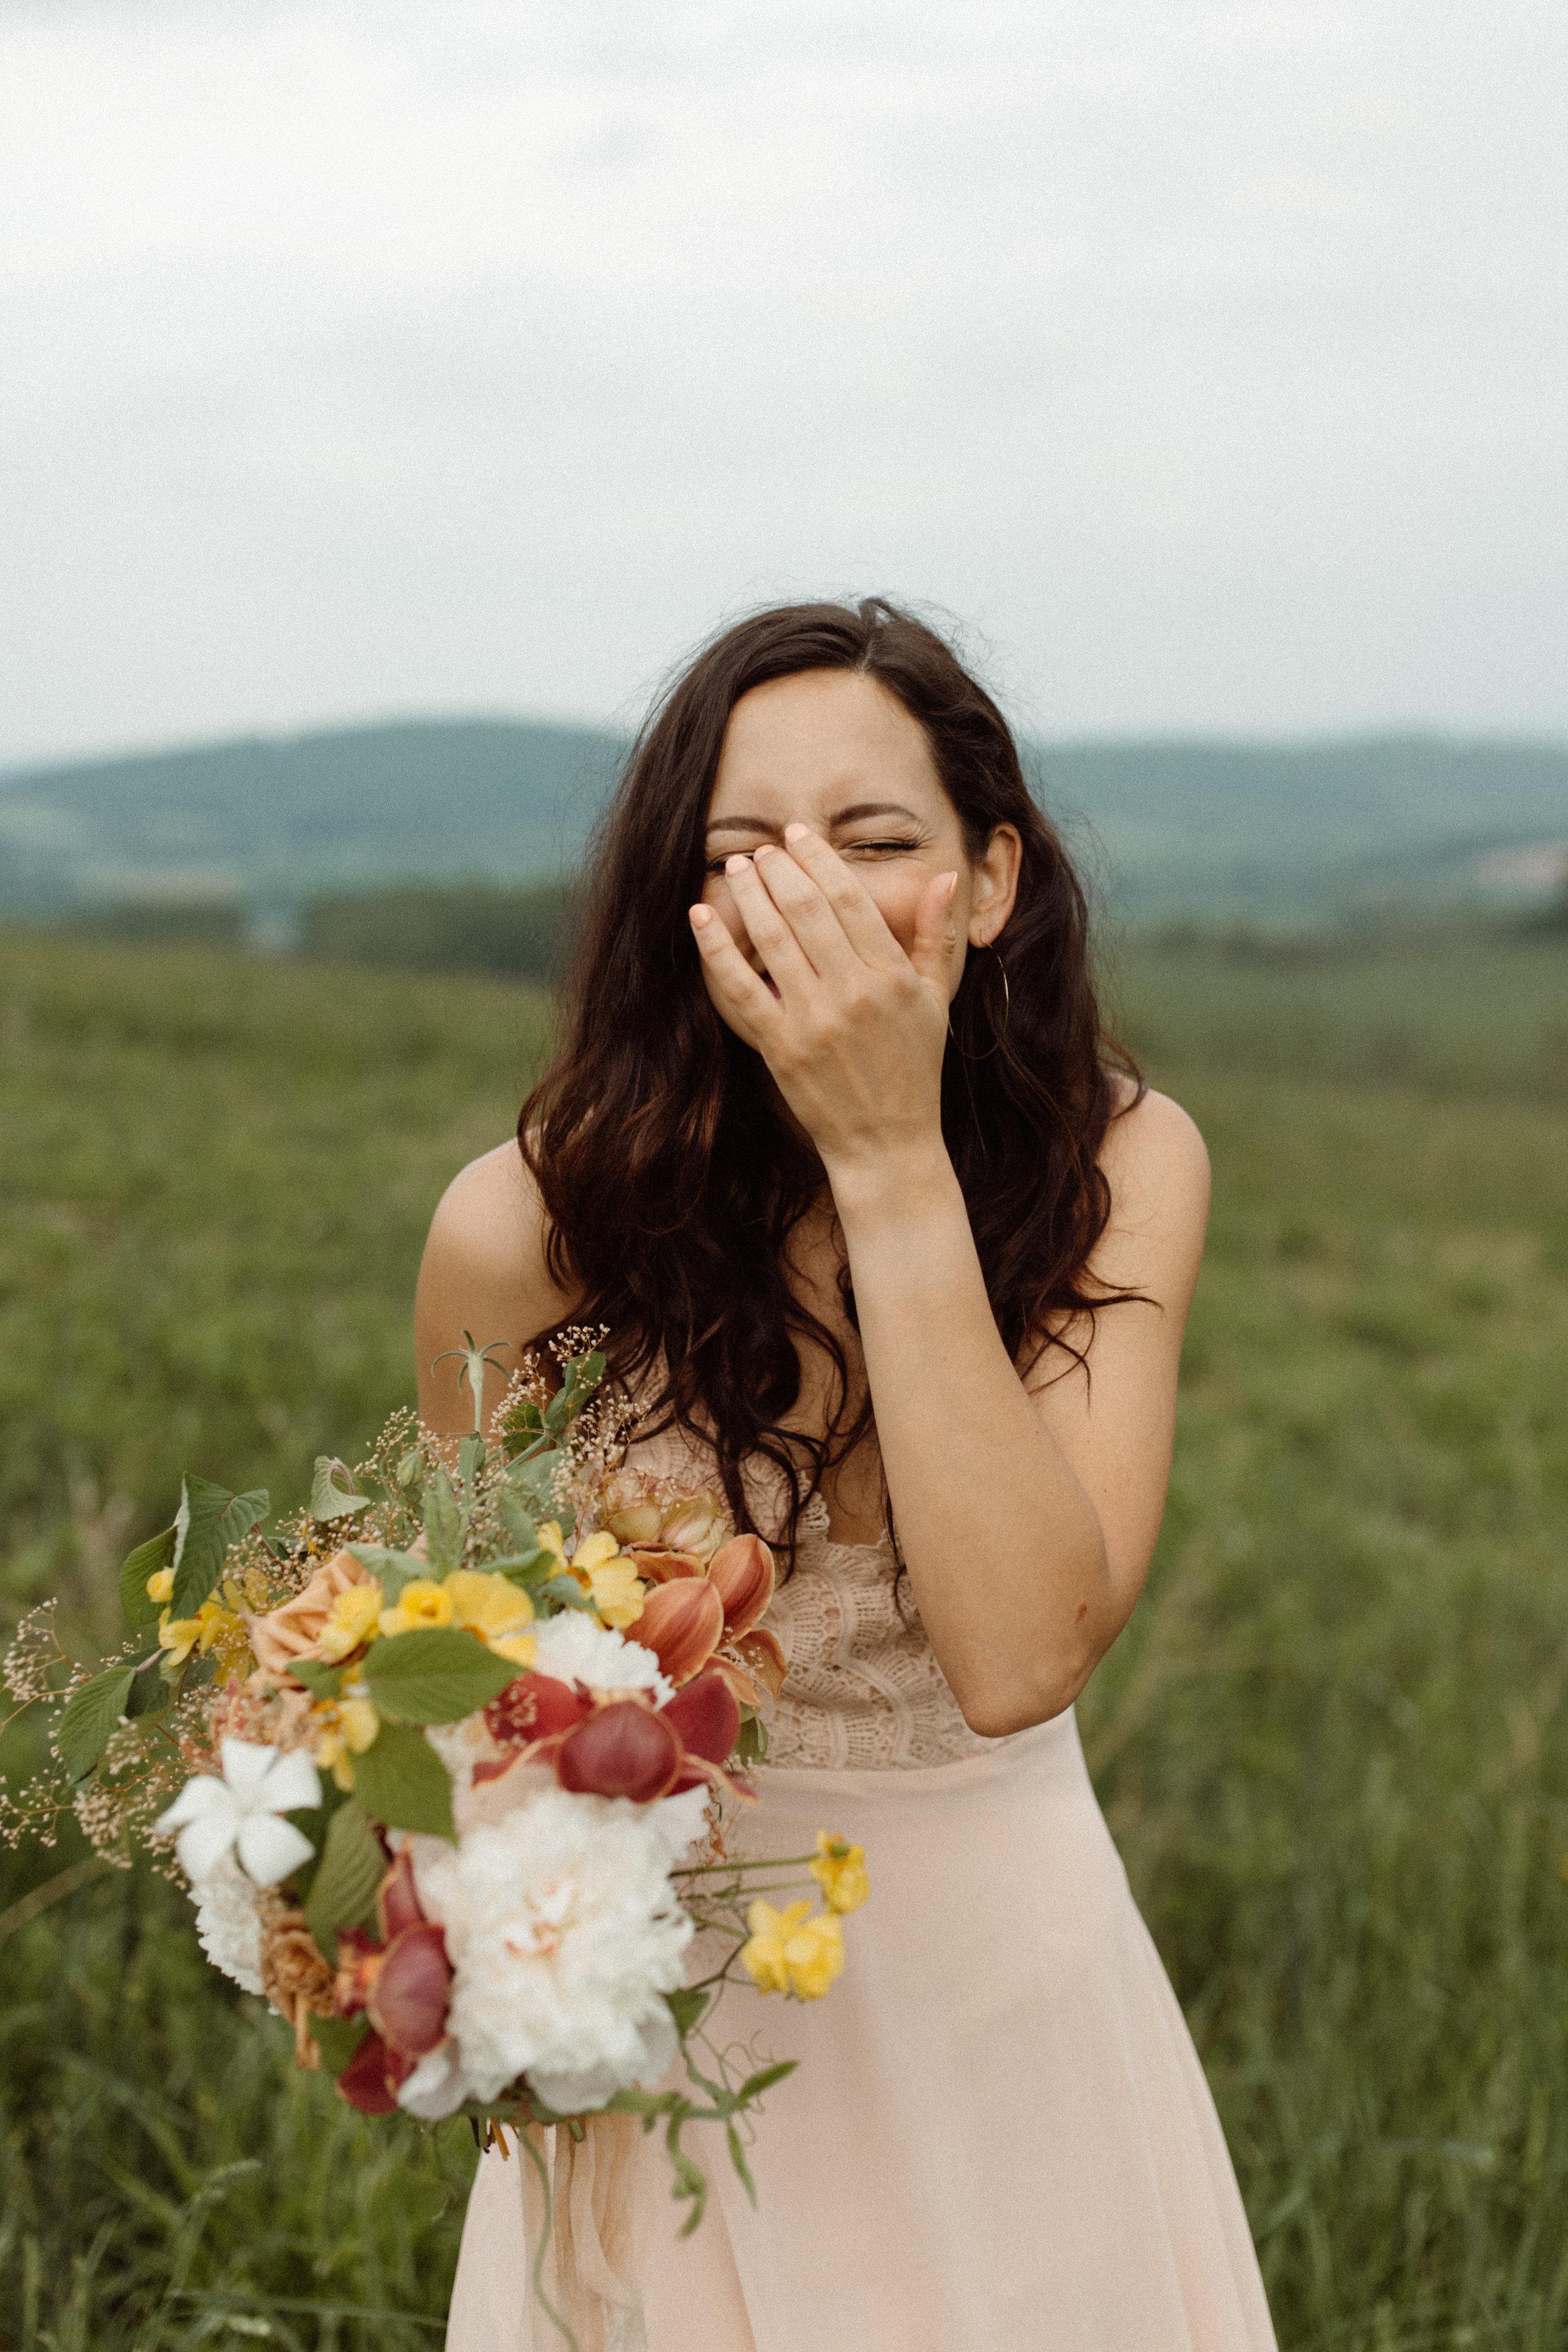 kelsey&mark-engagement-skymeadows-2019-peytoncurry-9477.jpg